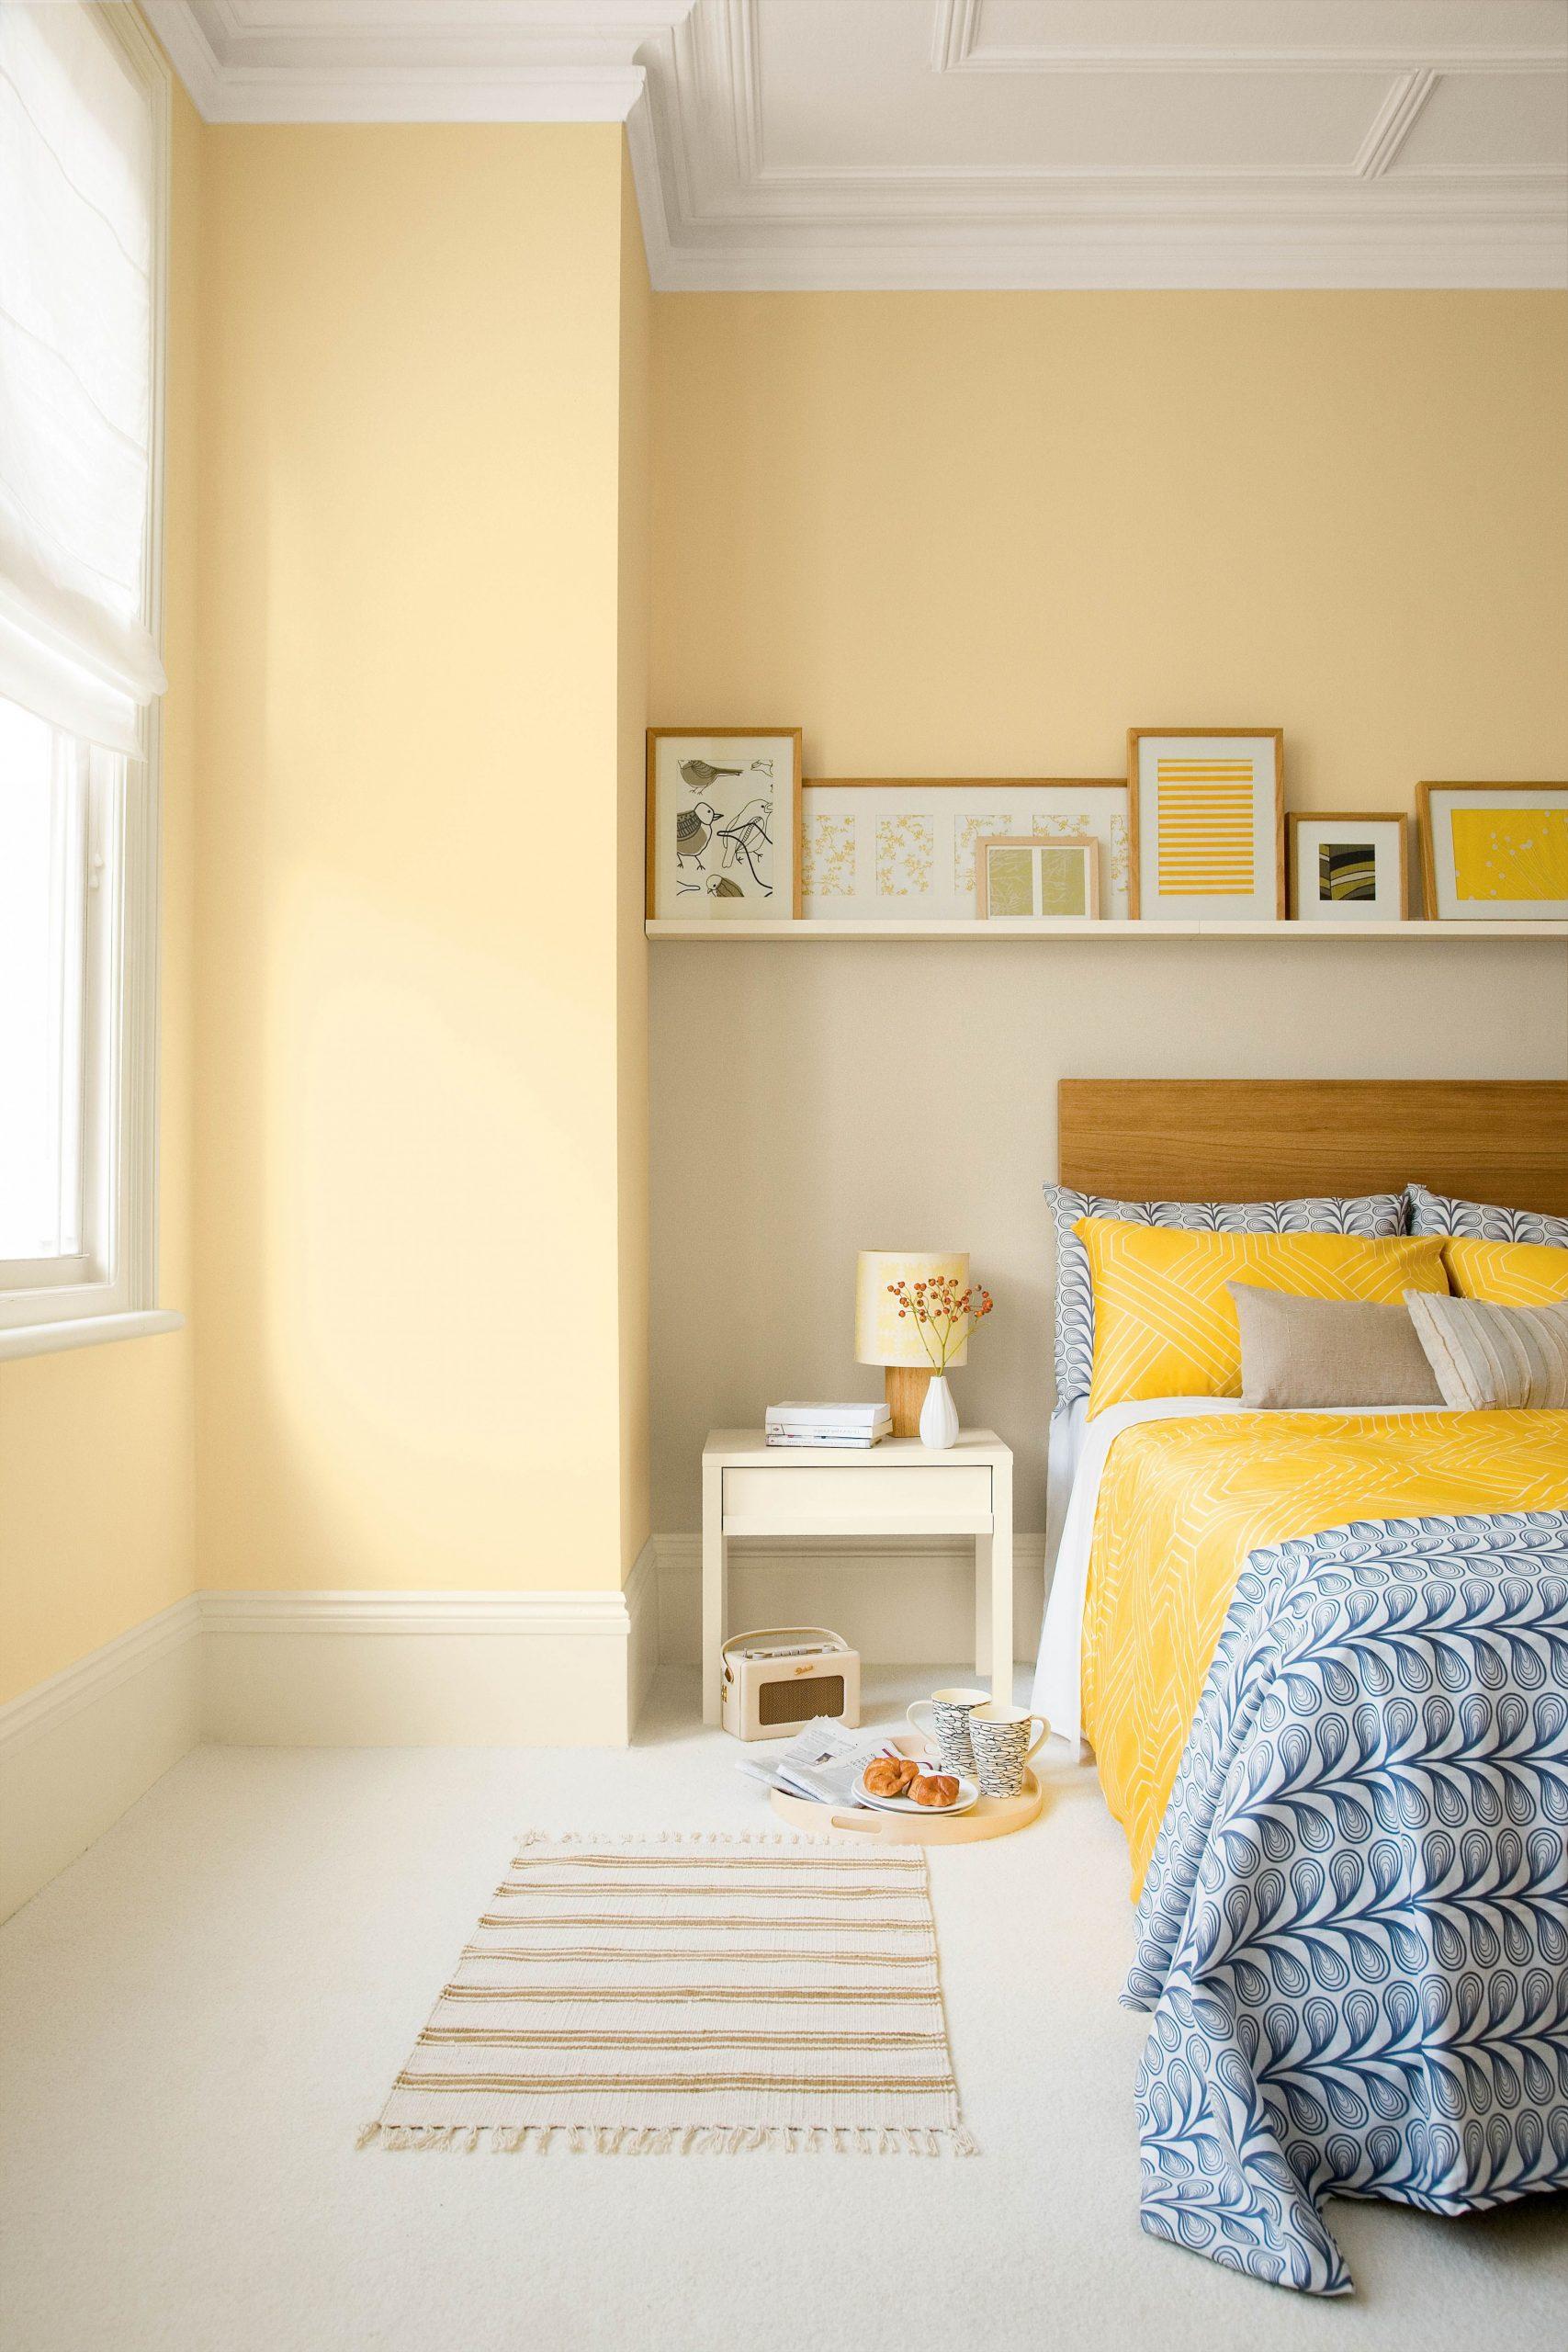 8 Yellow Bedroom Ideas To Brighten Your Space Just In Time For Spring - Bedroom Ideas Yellow Walls